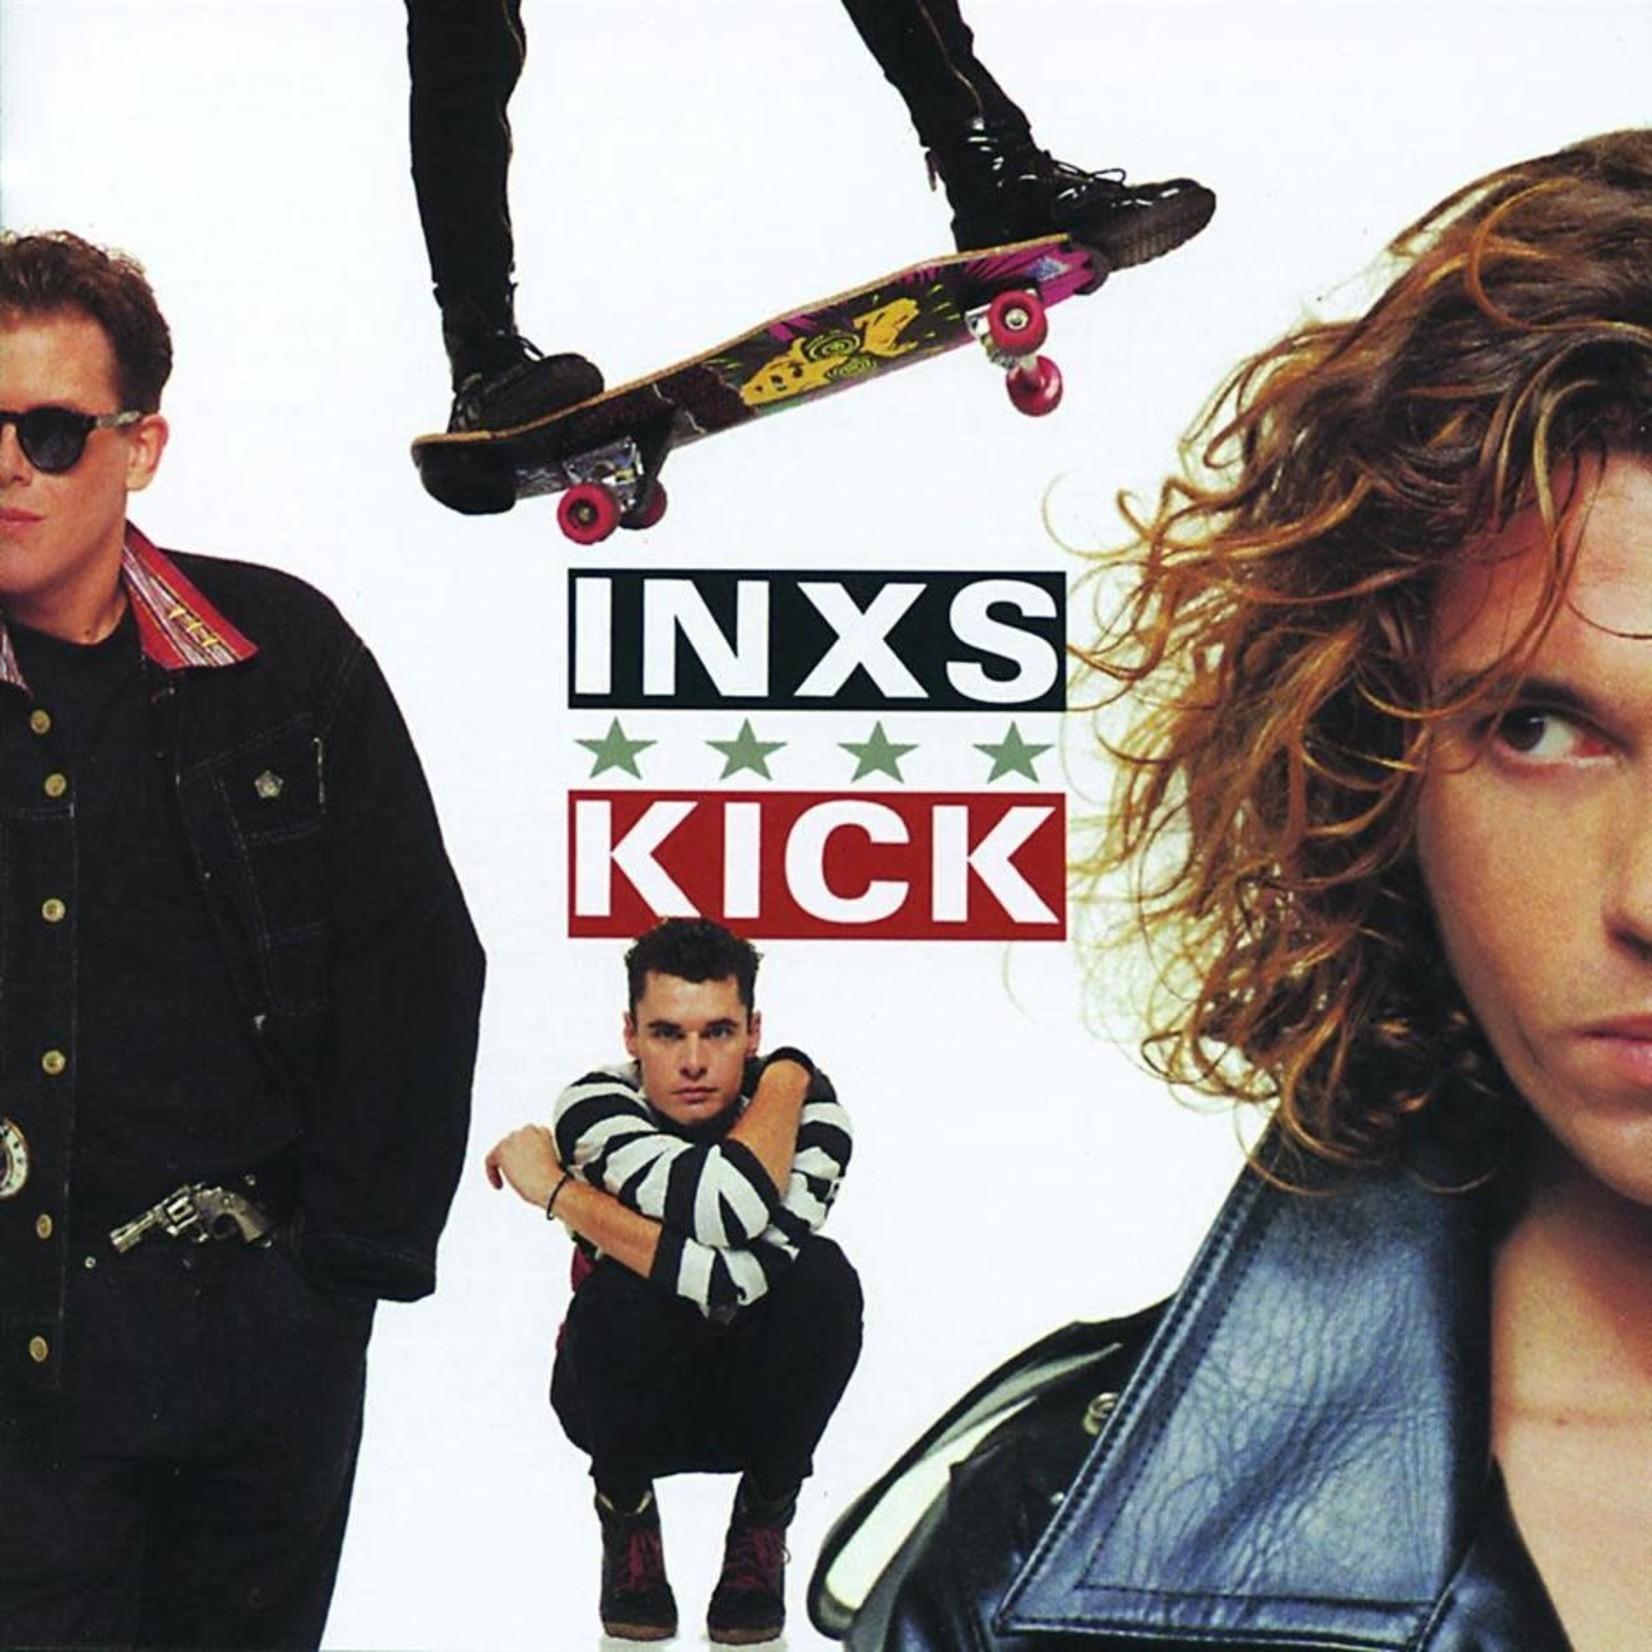 [Vintage] INXS: Kick